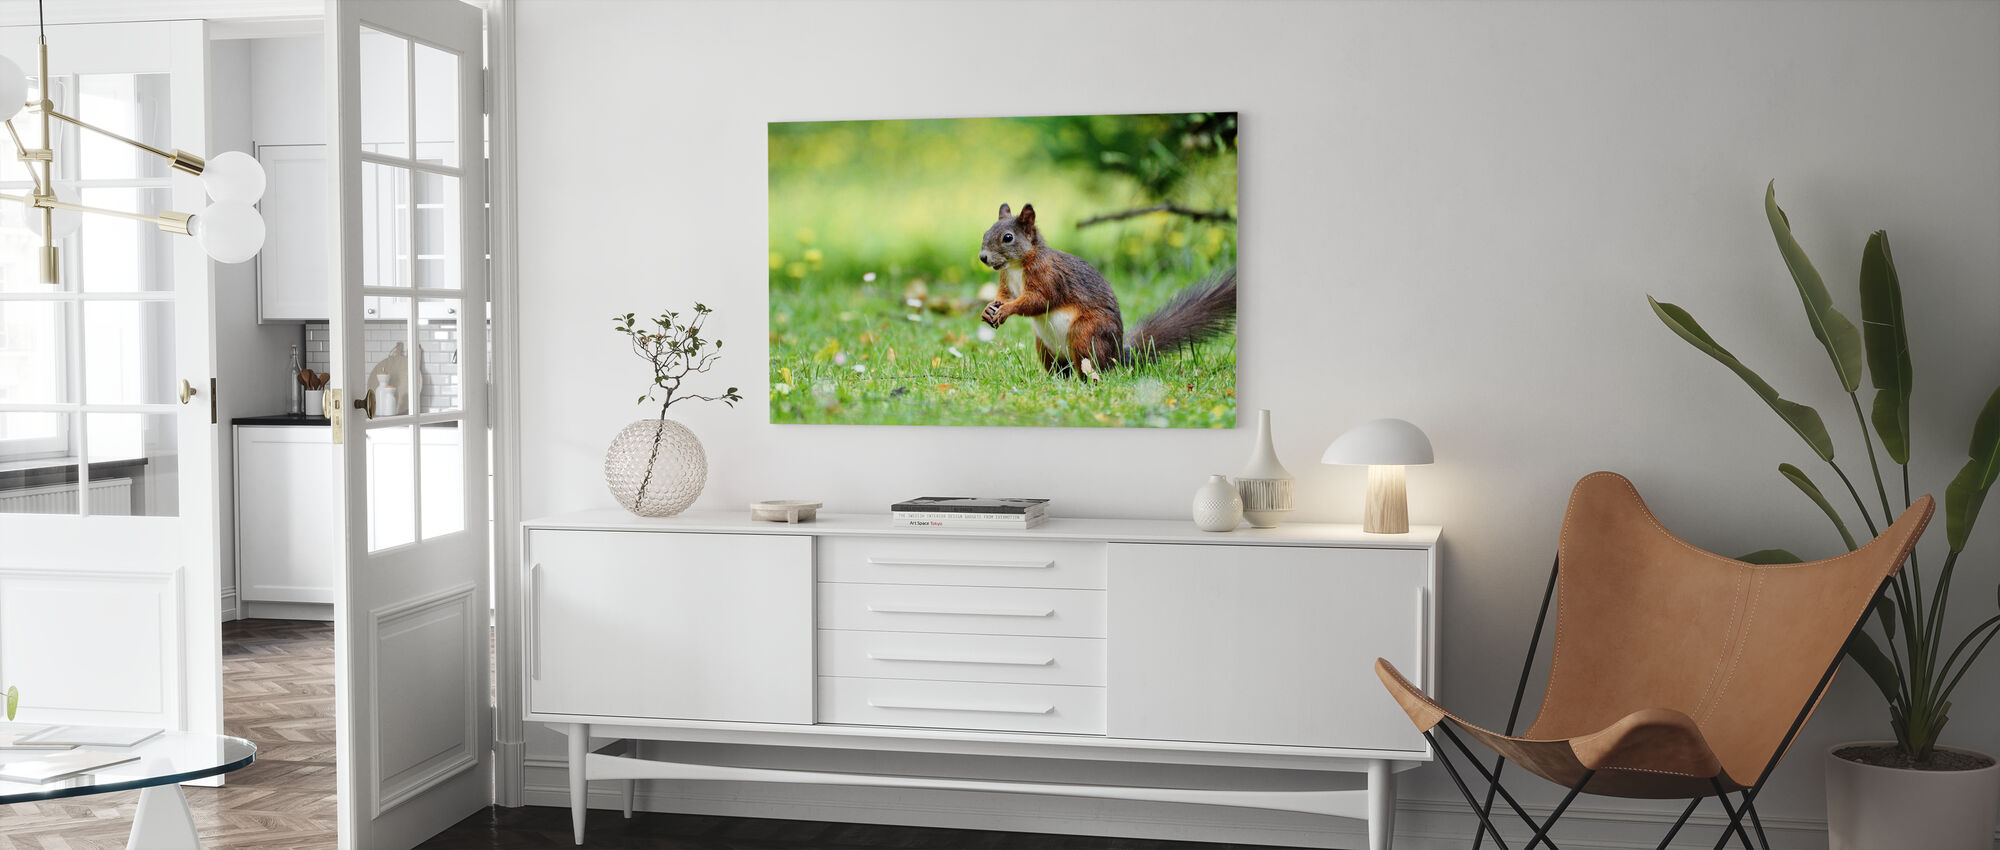 Oravien väestönlaskenta - Canvastaulu - Olohuone